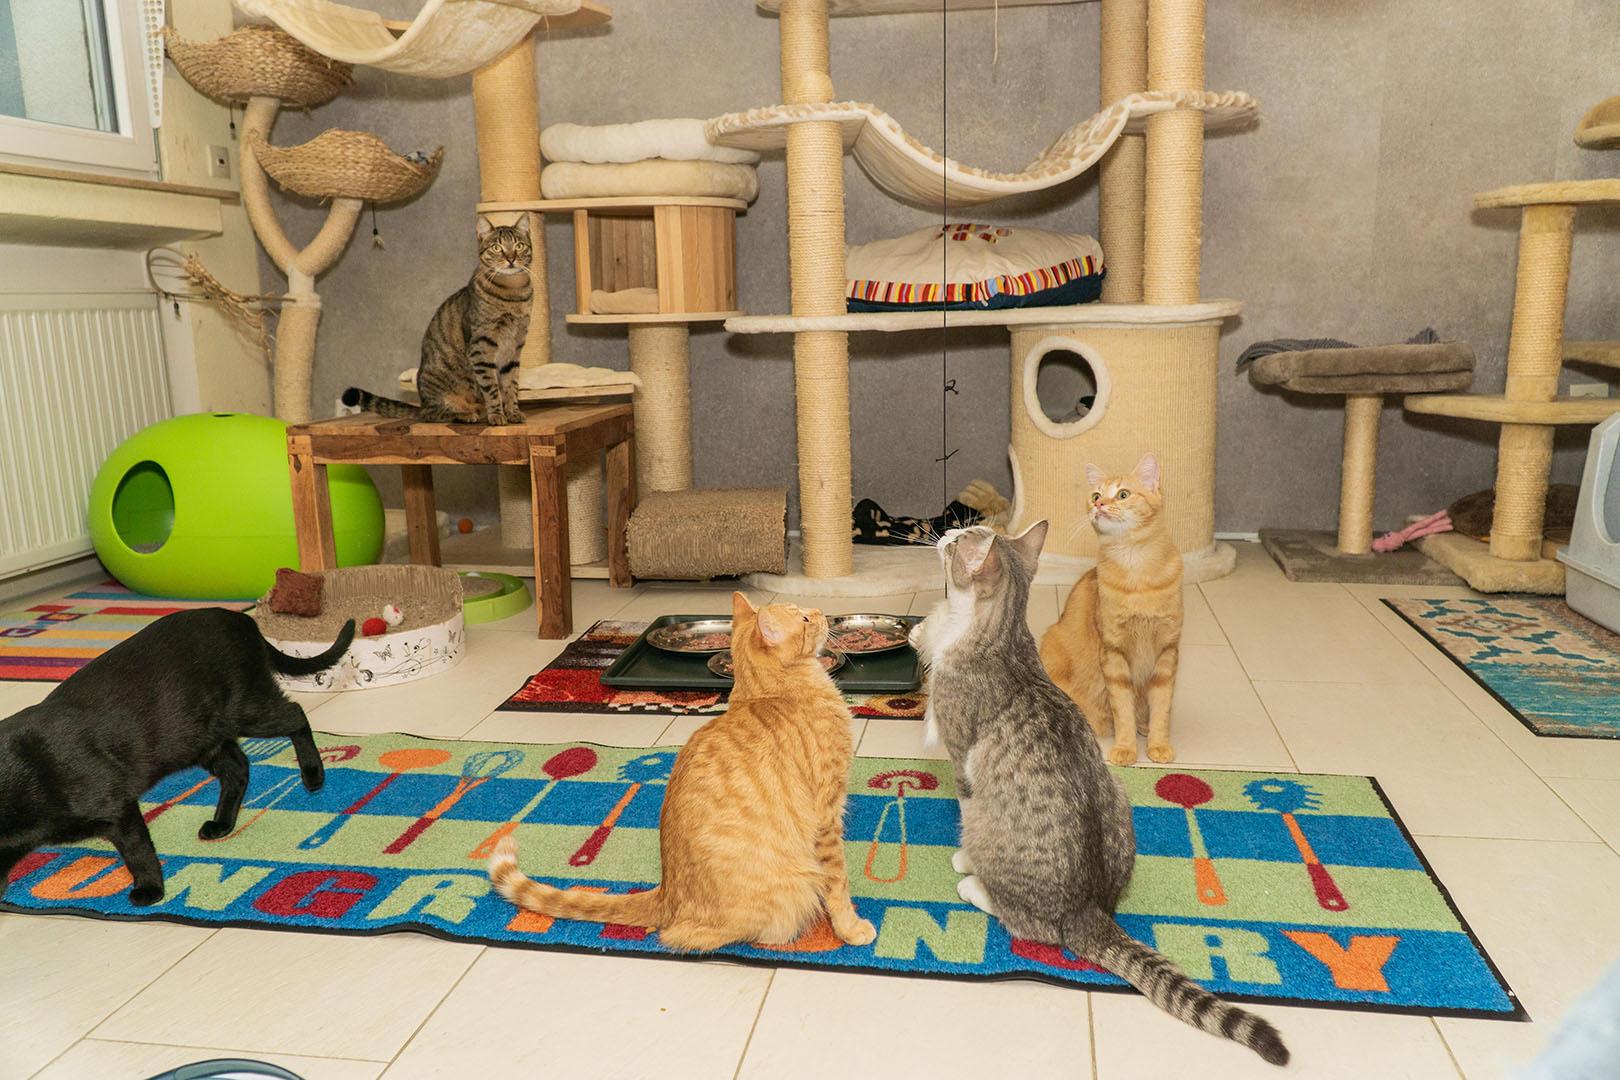 Pflegekatzen Startseite 30.10.18 (5)